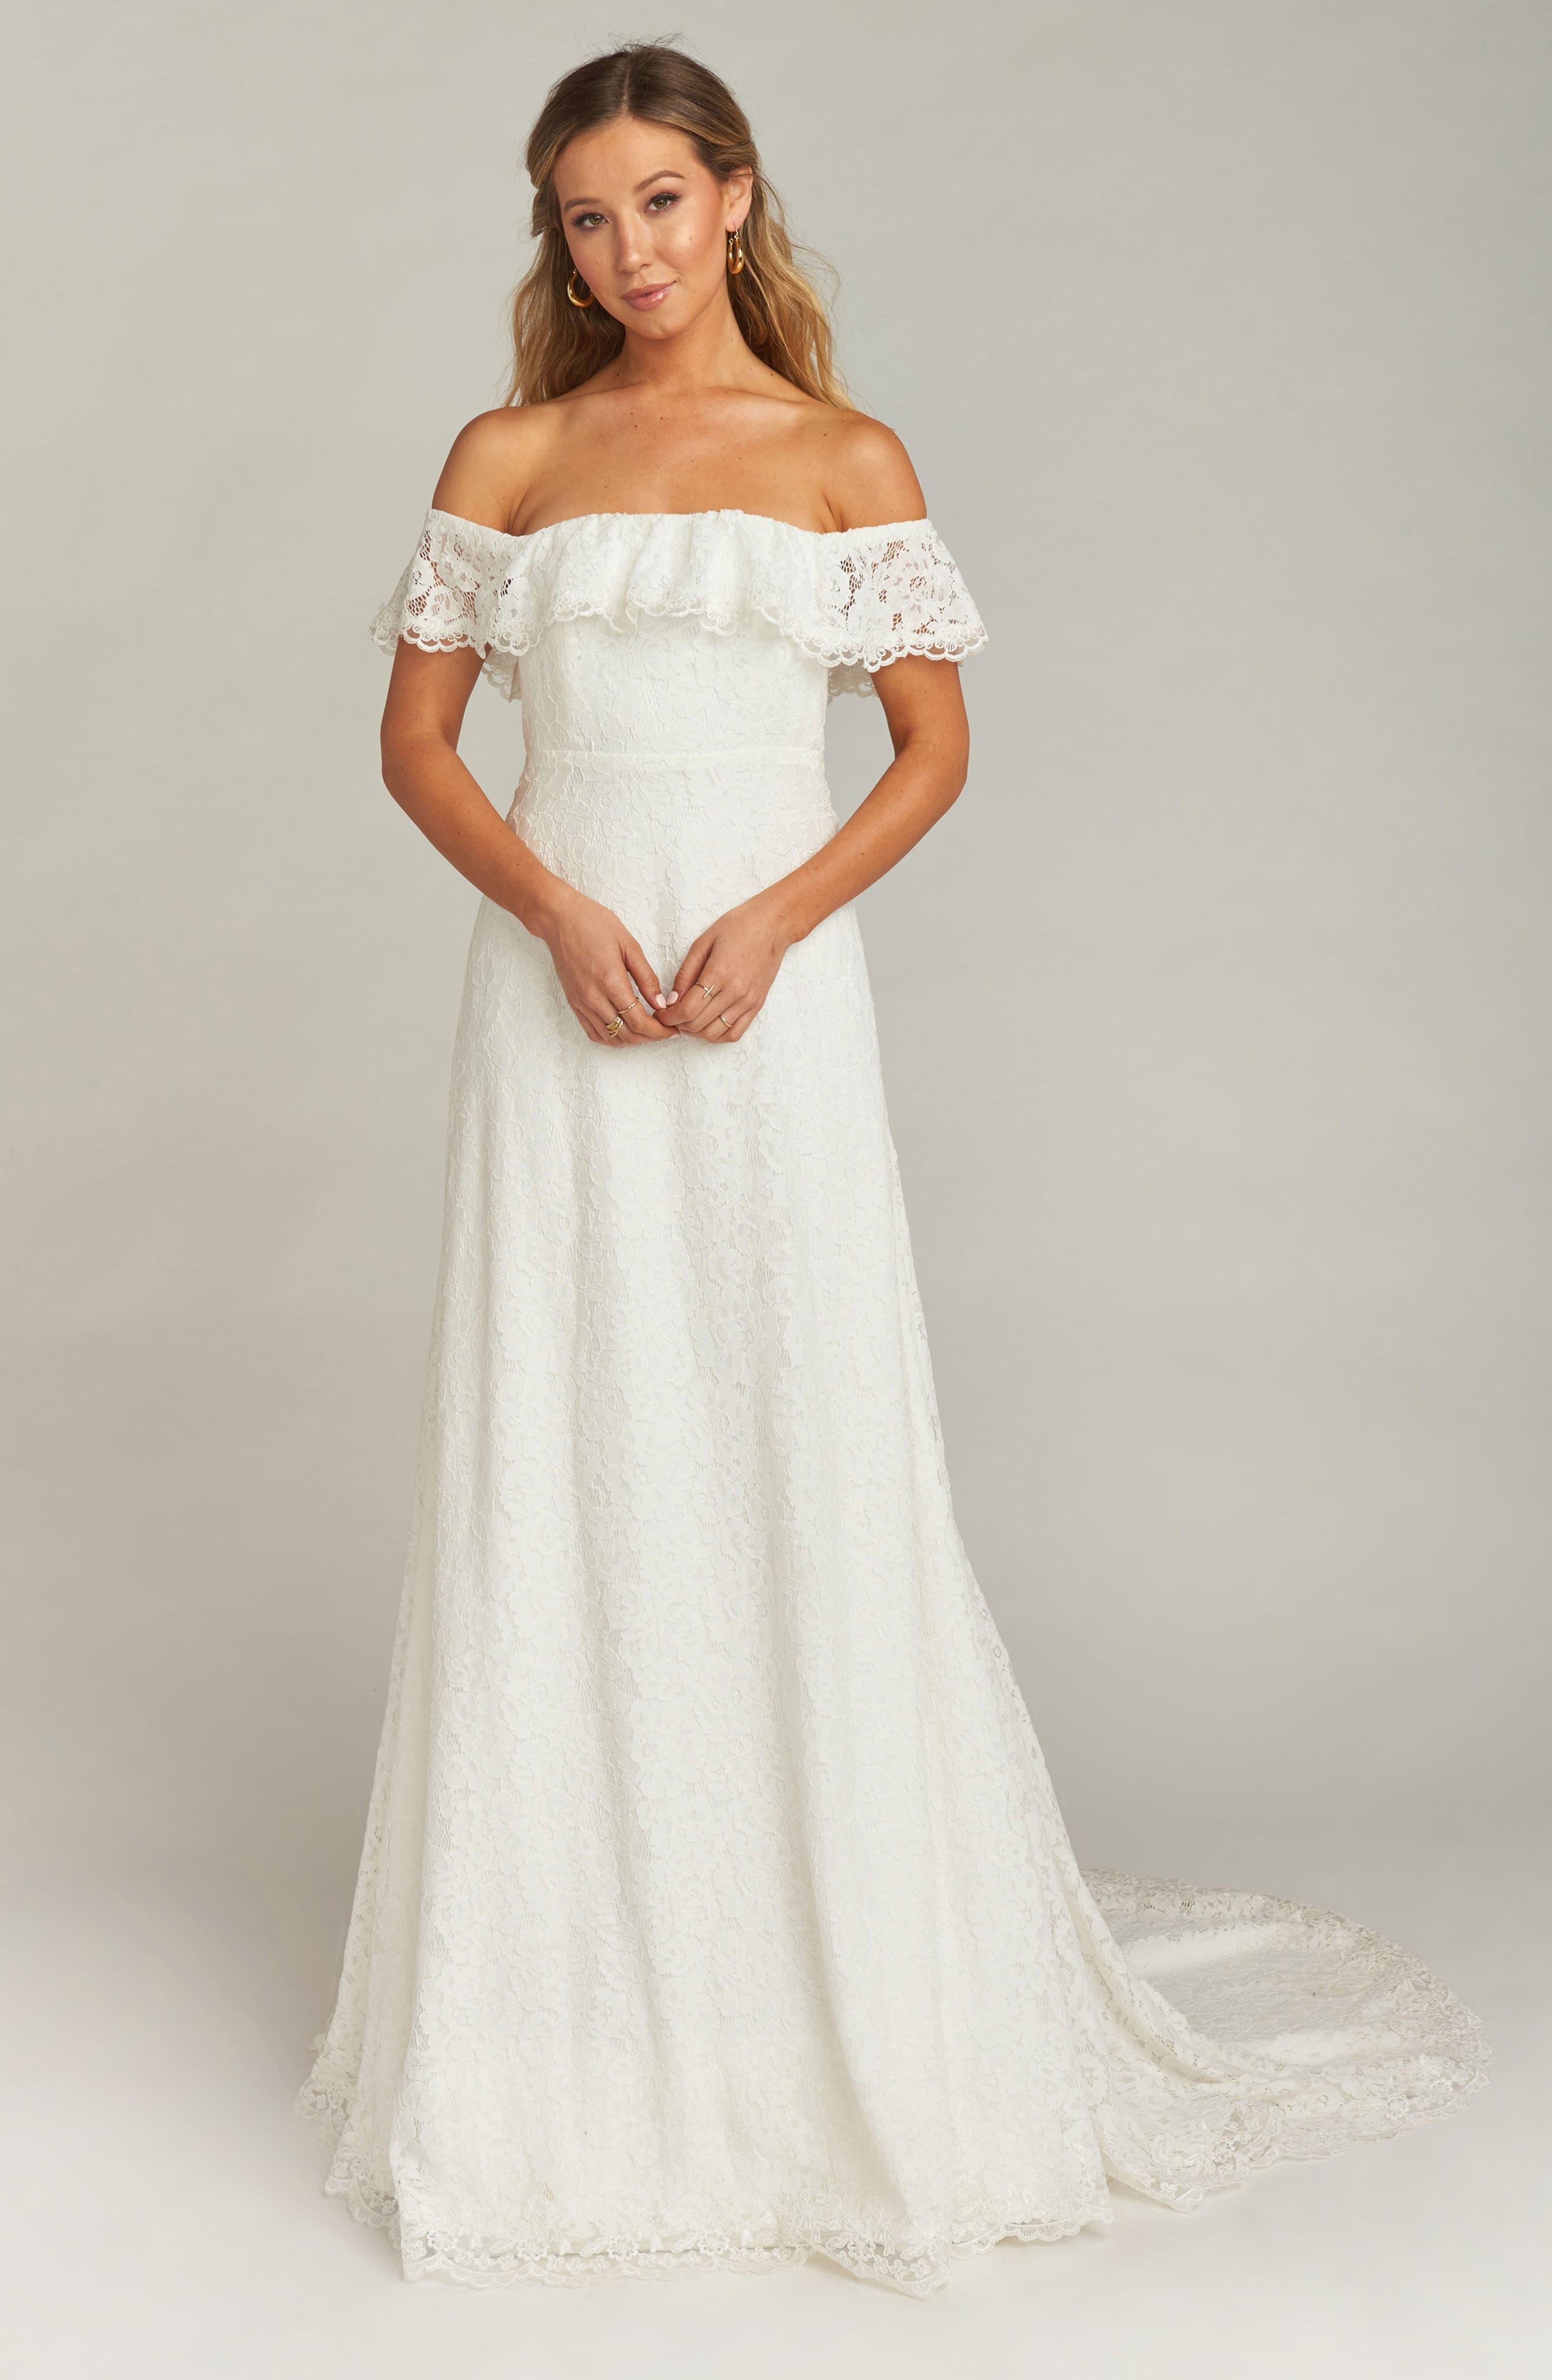 Karolina Off the Shoulder Lace Wedding Dress,                             Main thumbnail 1, color,                             WHITE